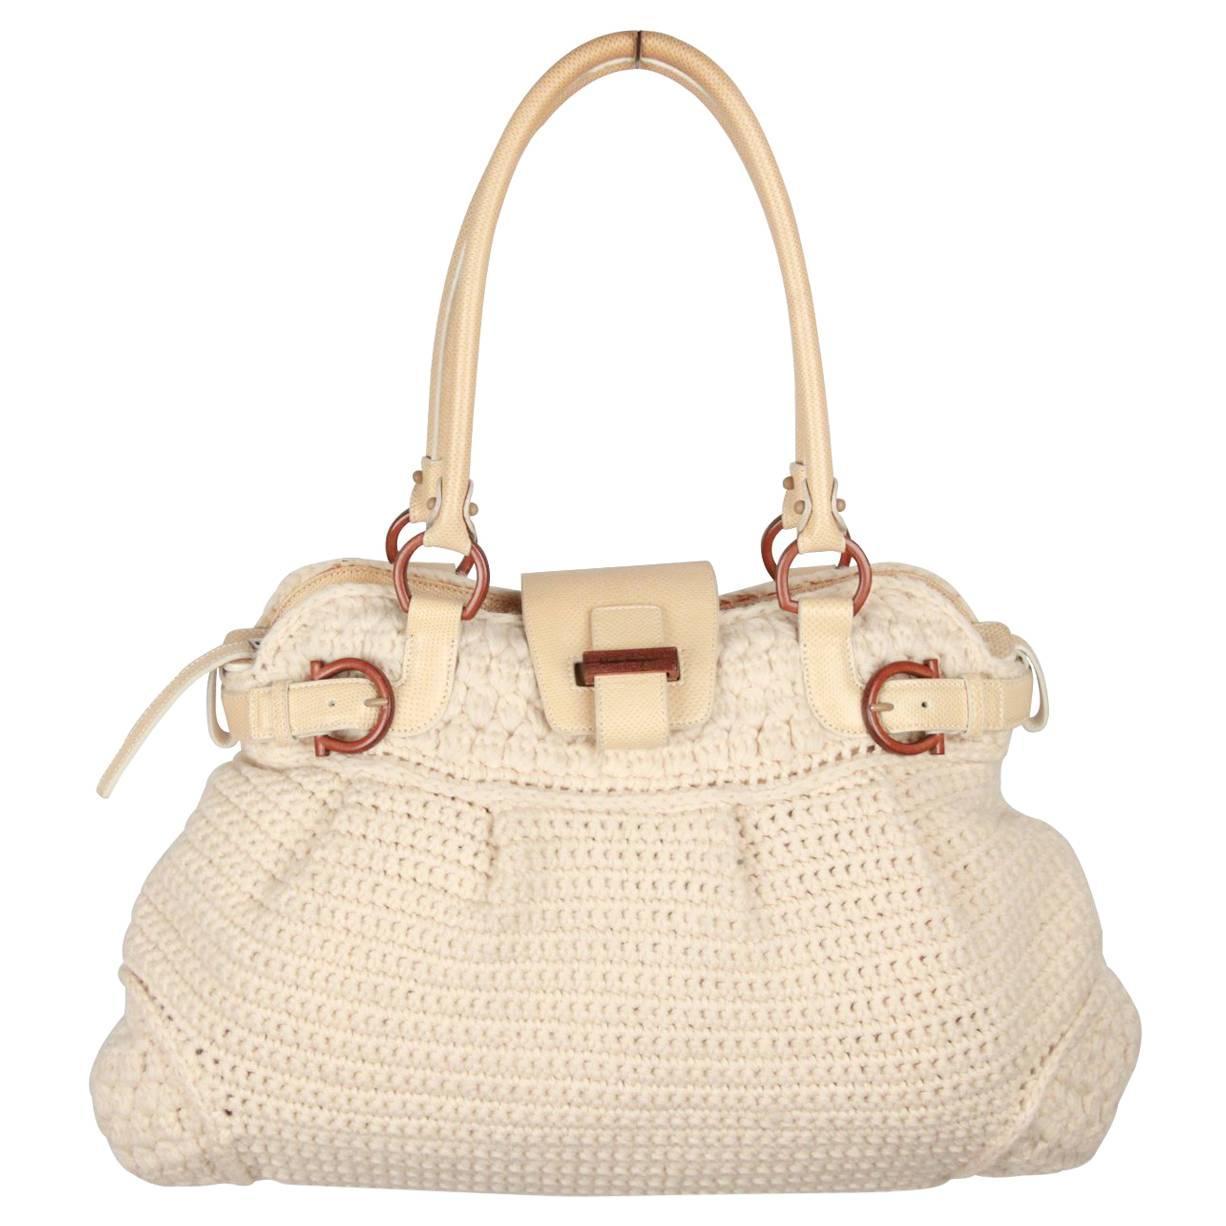 6ff97a04cc SALVATORE FERRAGAMO Ivory Wool Knit MARISA Shoulder Bag For Sale at 1stdibs